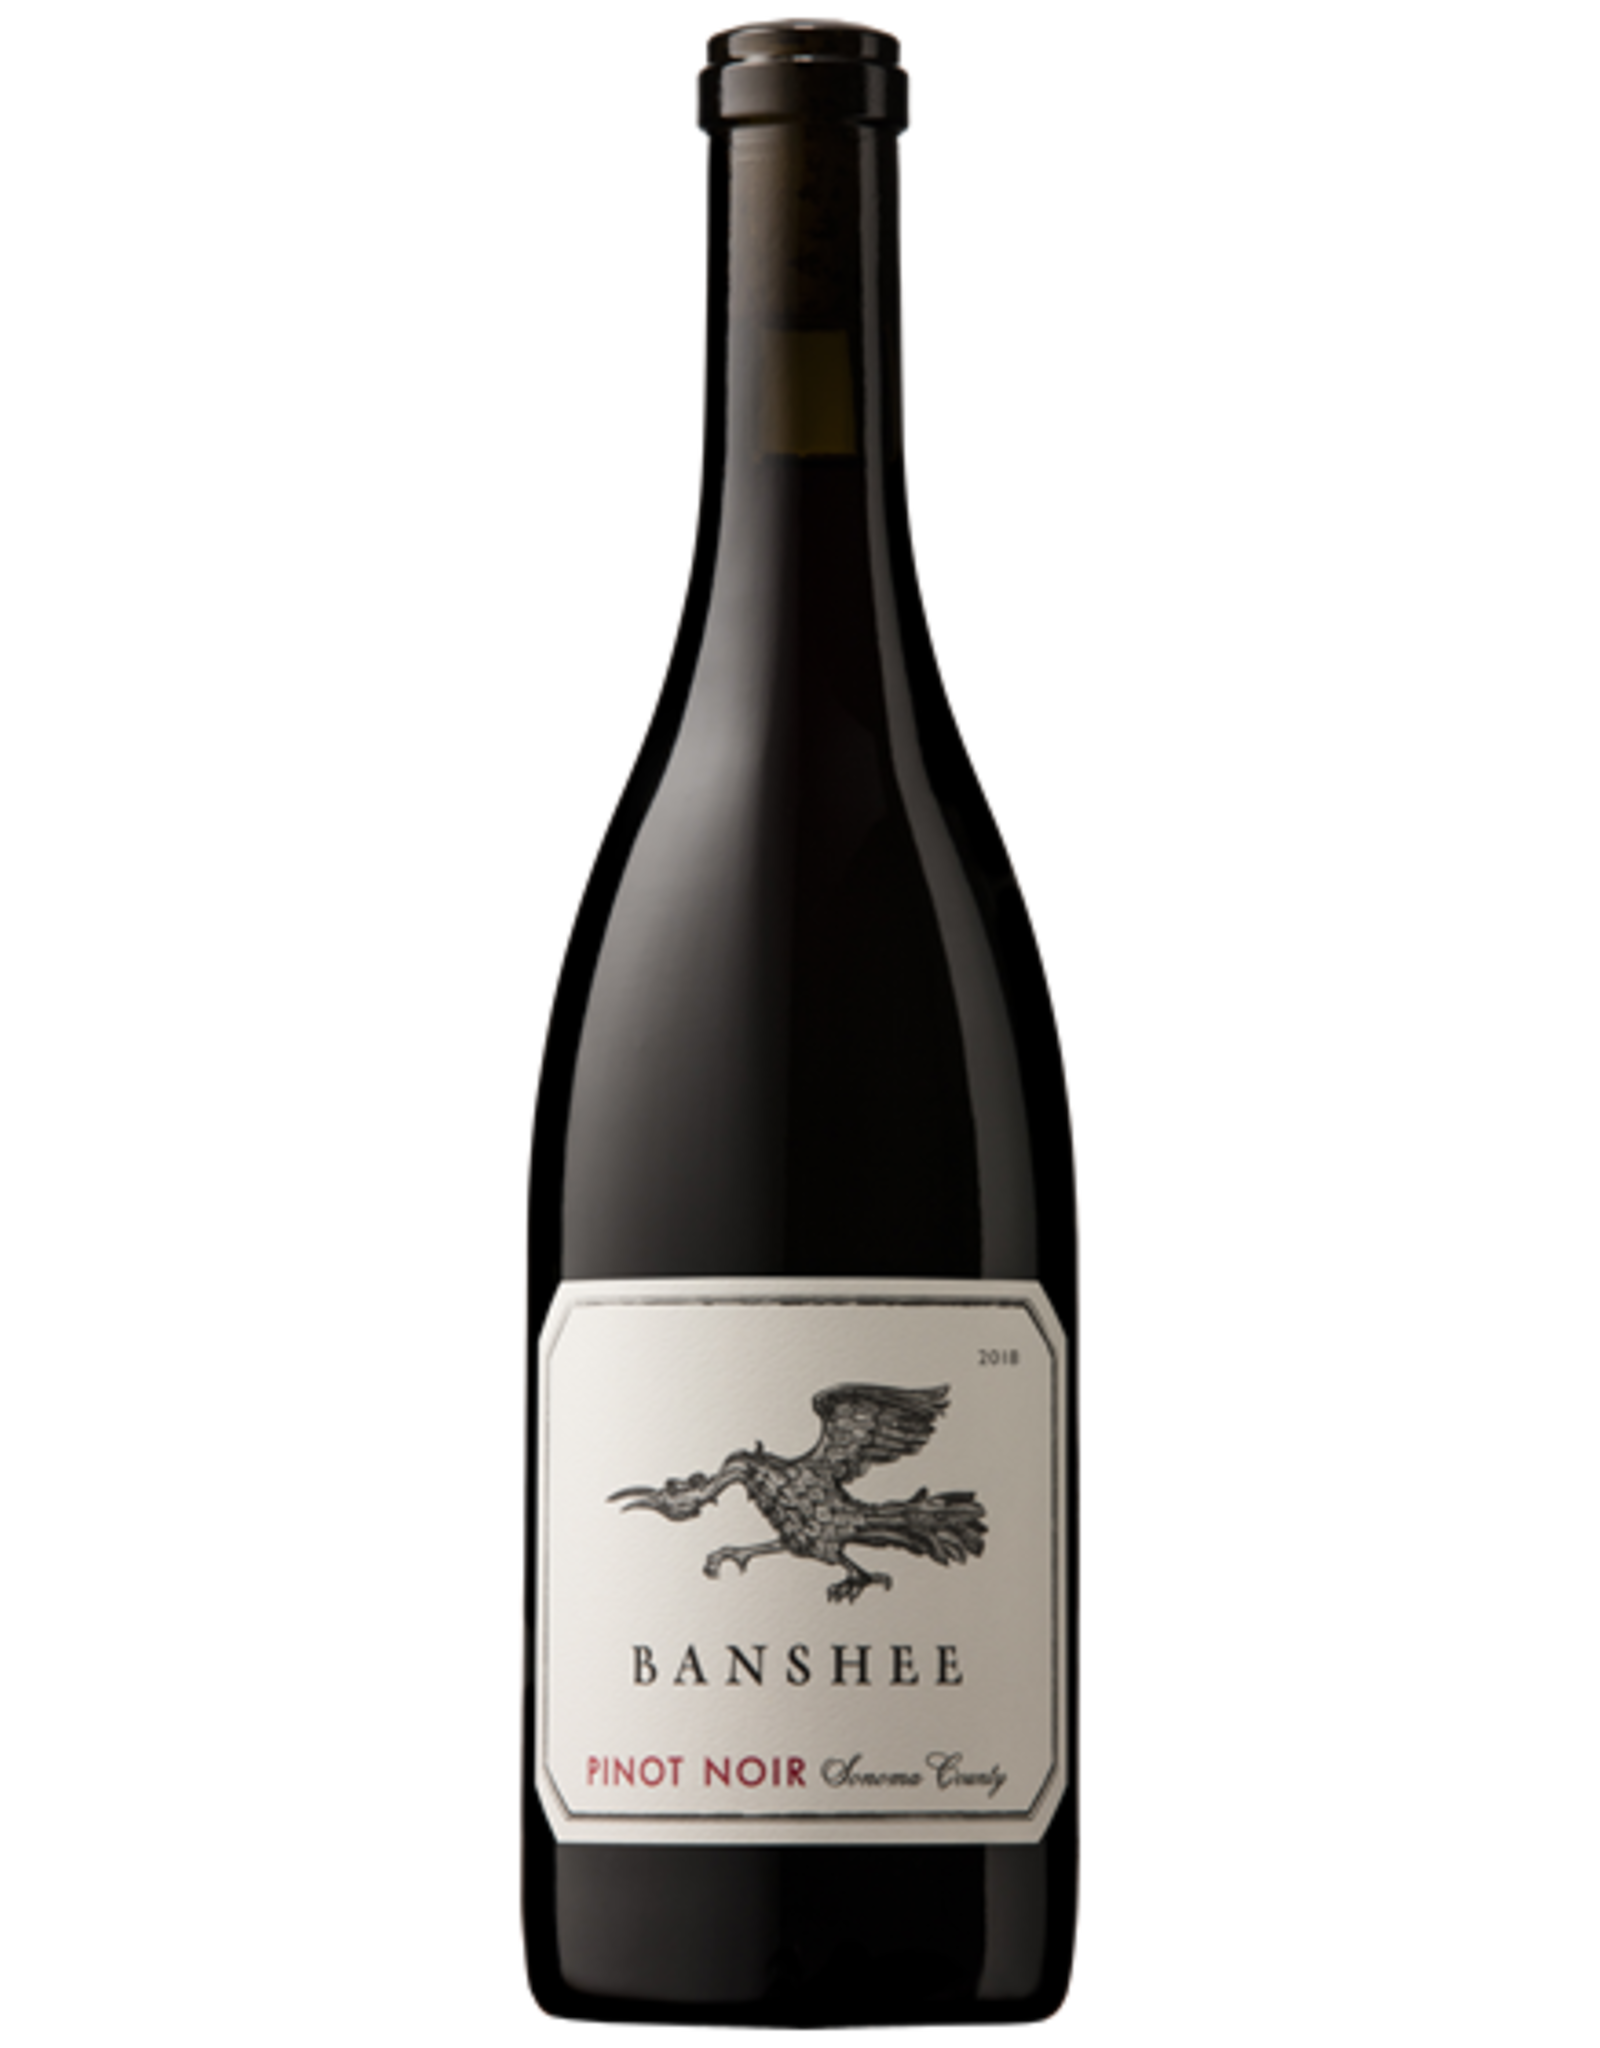 Banshee Sonoma County Pinot Noir